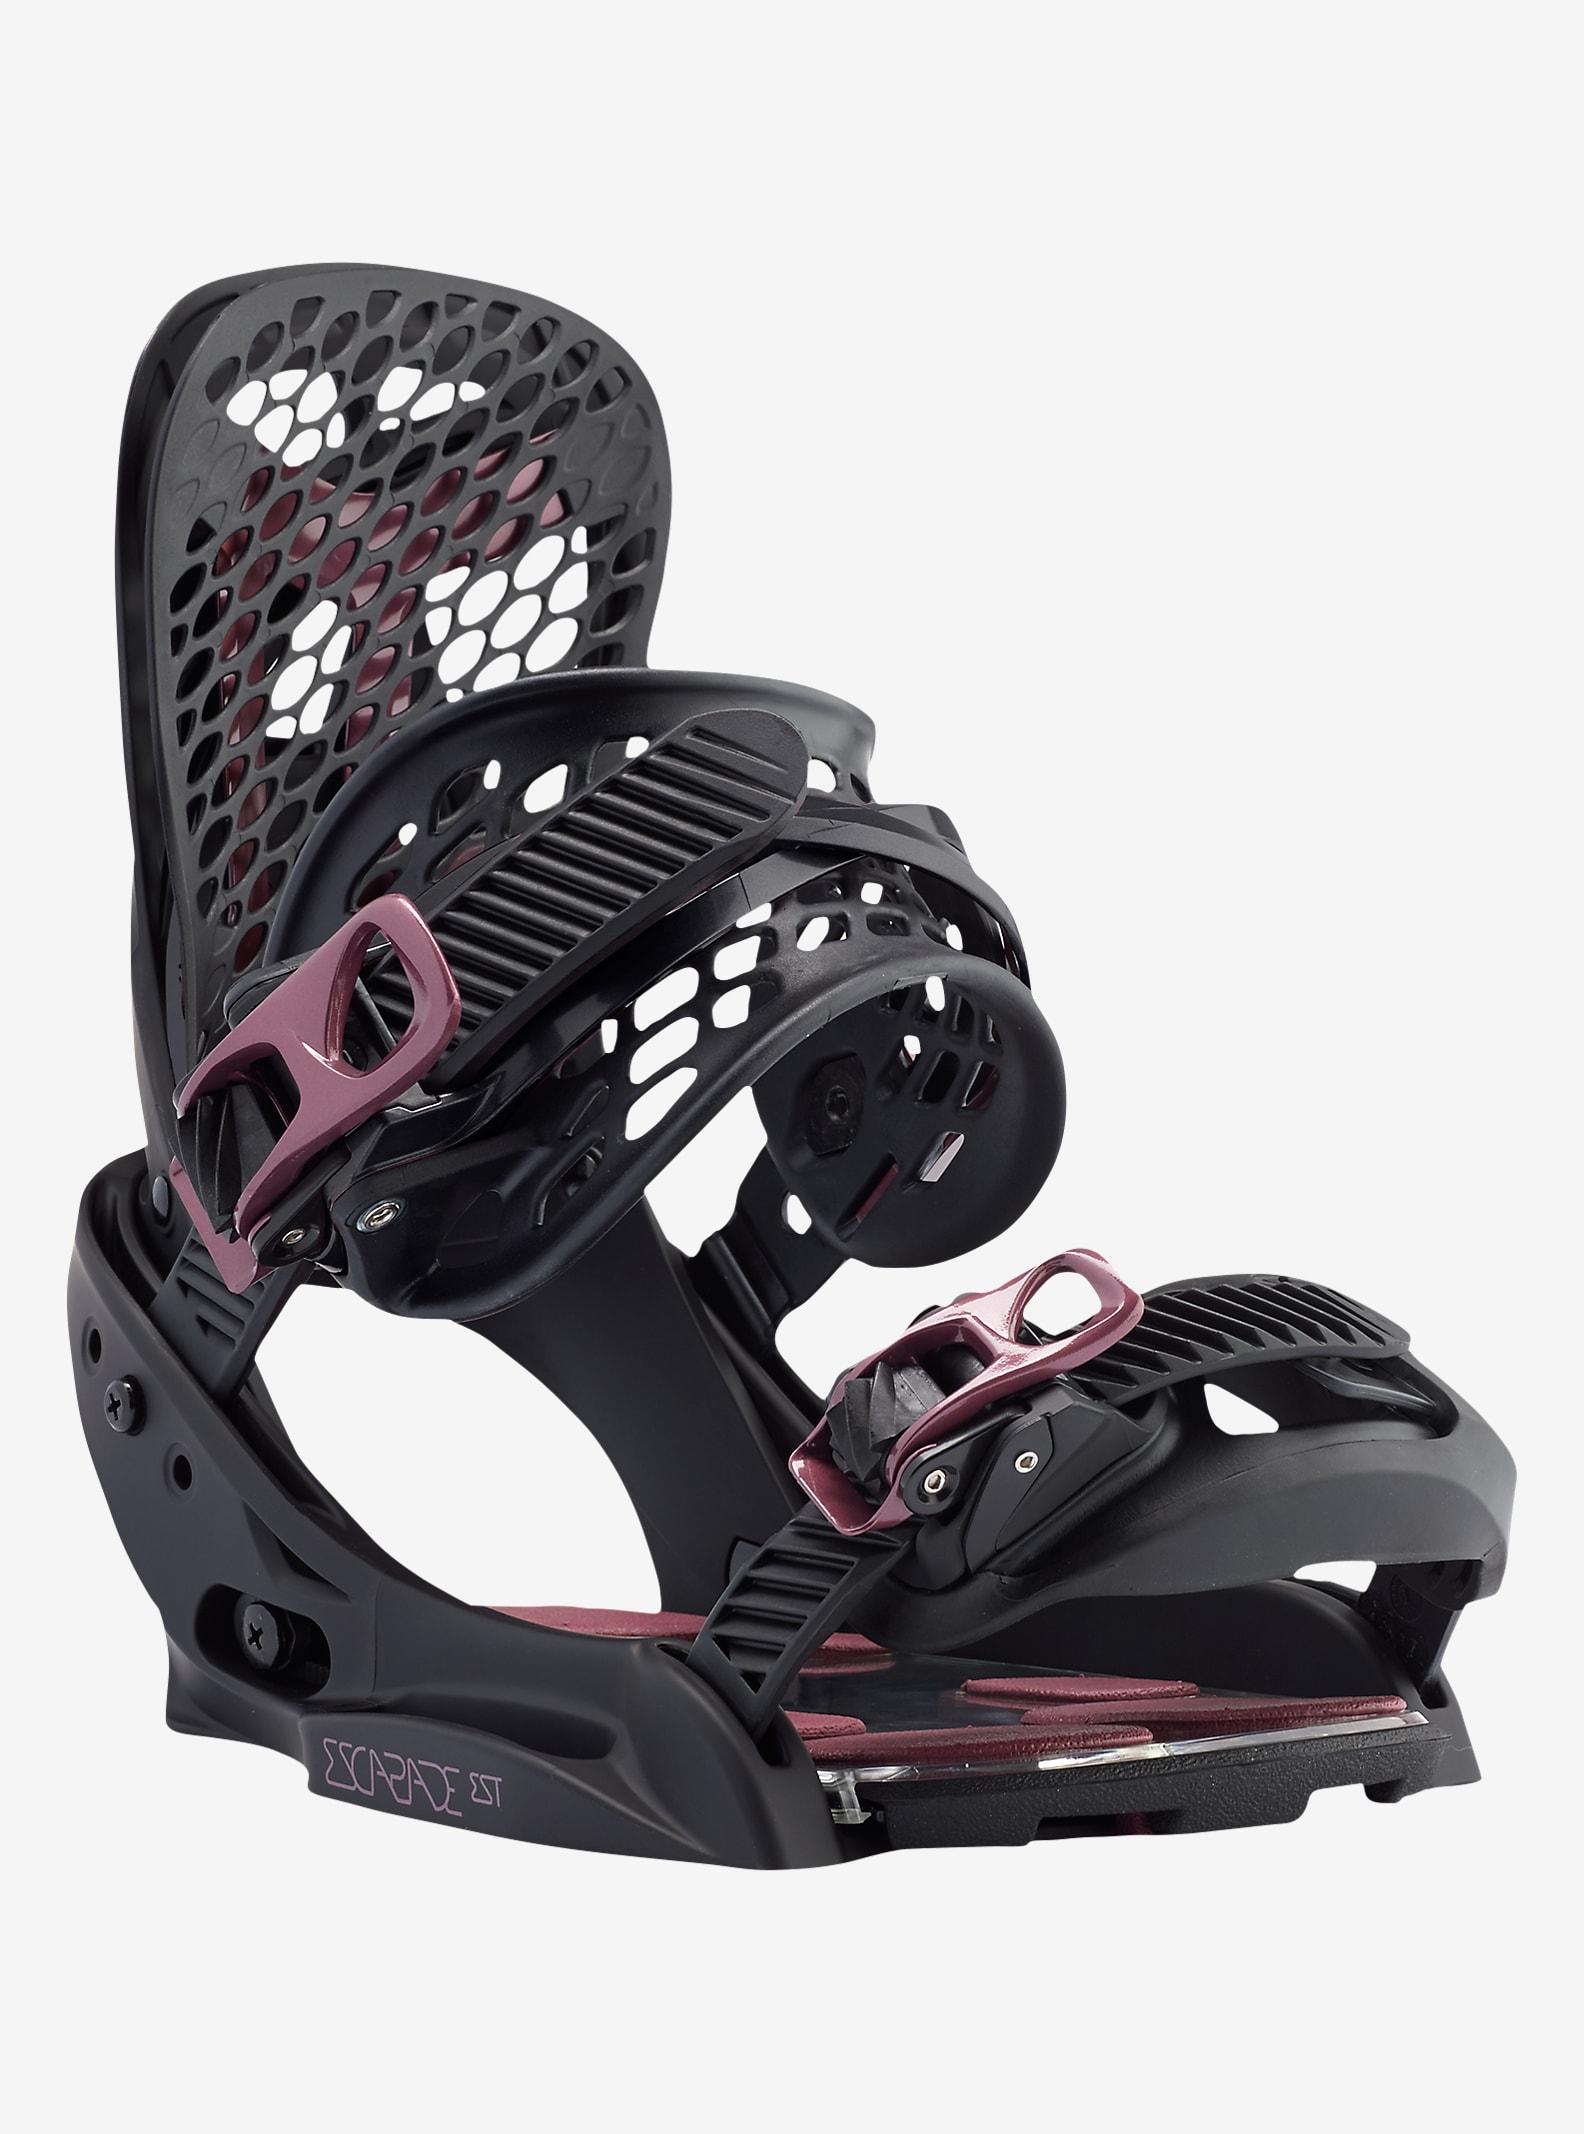 Burton Escapade EST Snowboard Binding shown in Black